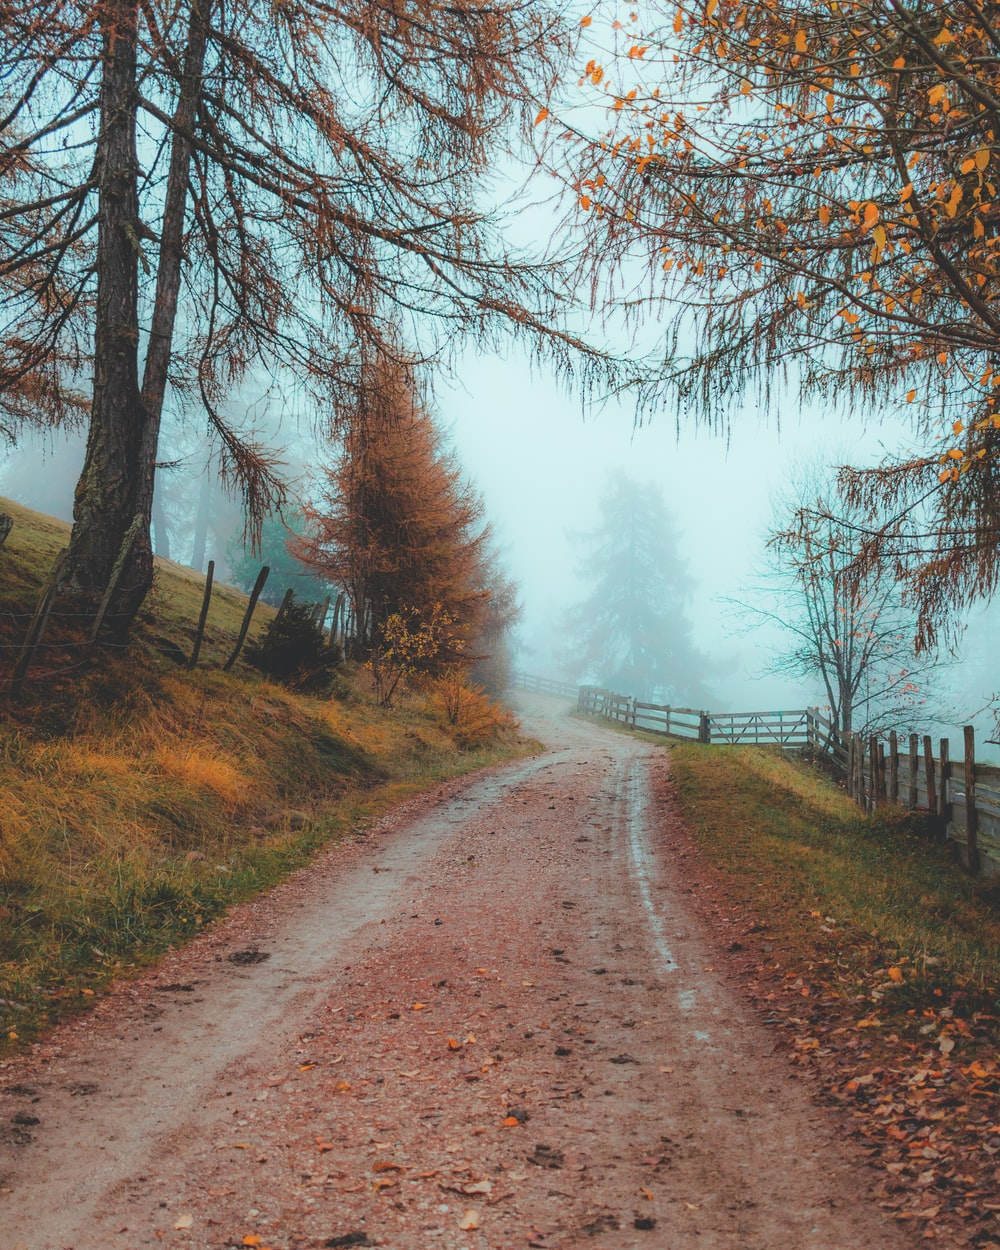 brown dirt road between trees during daytime